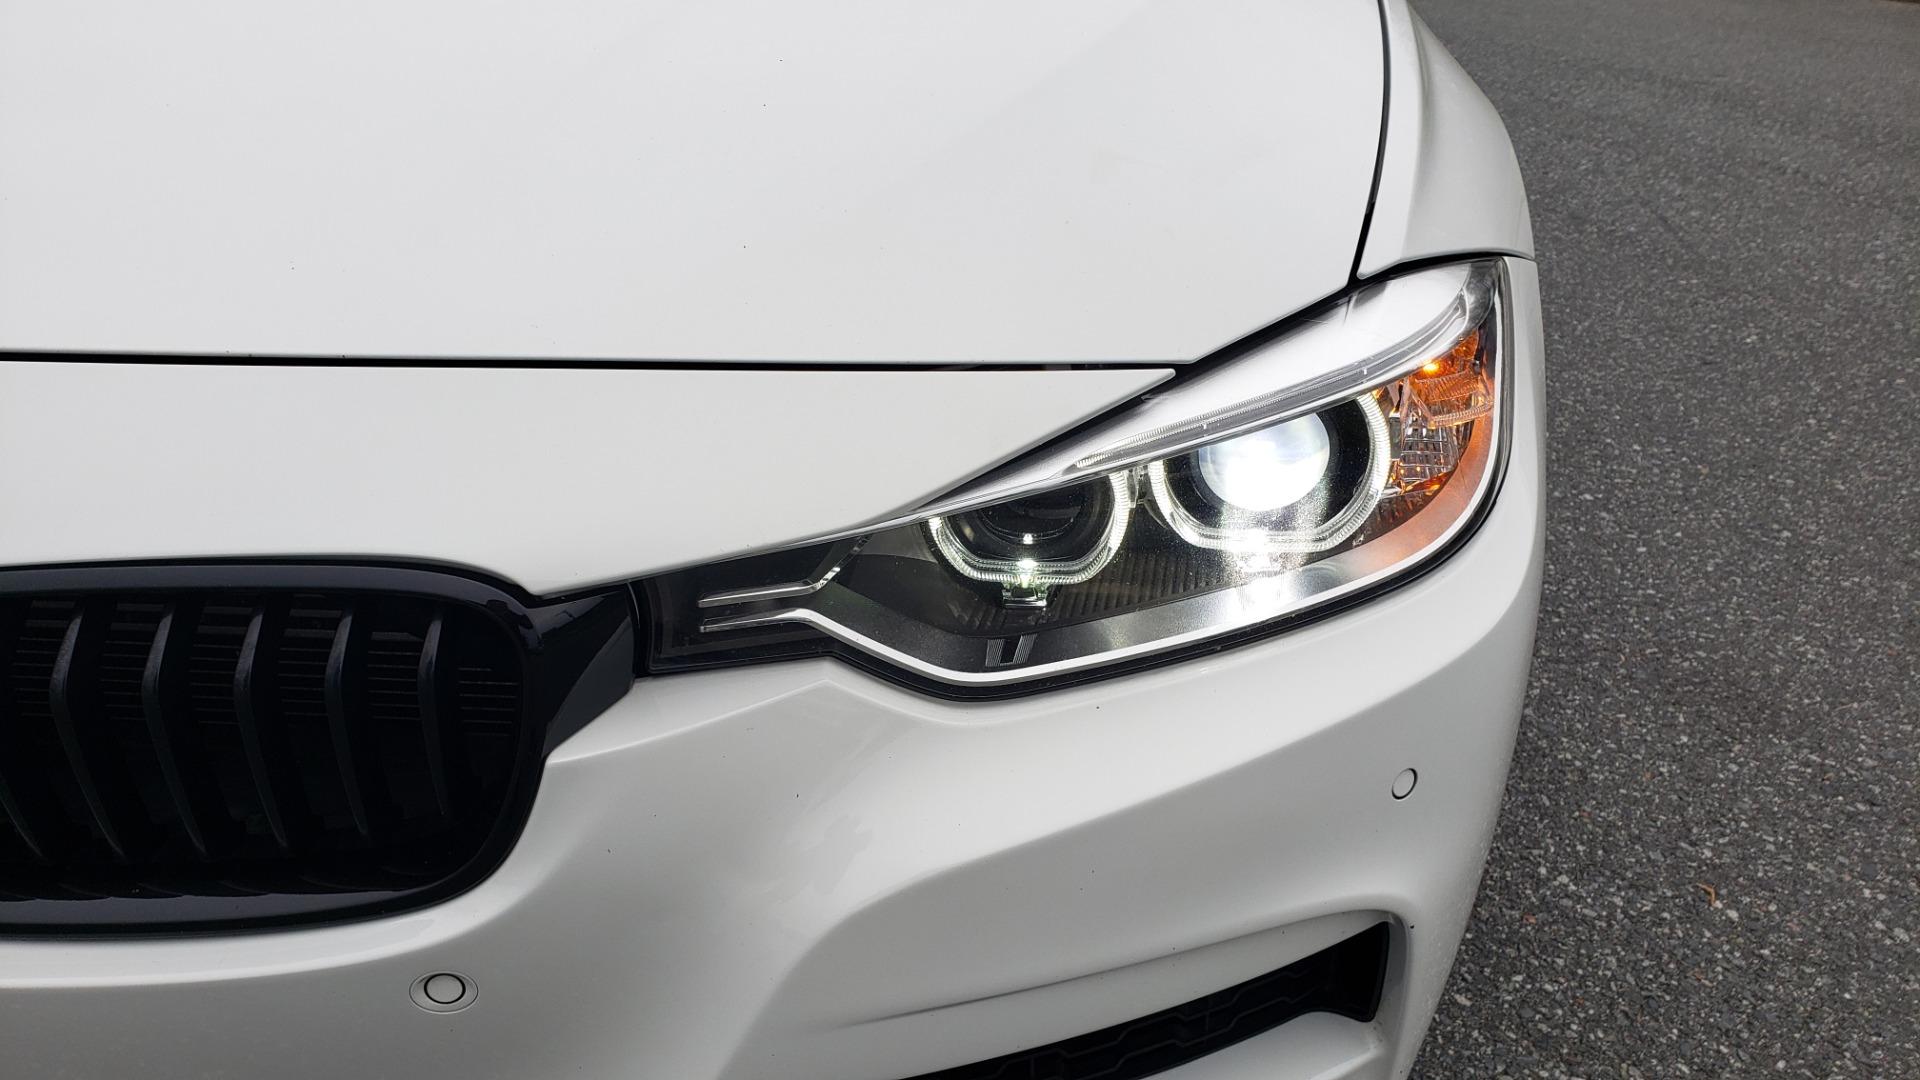 Used 2015 BMW 3 Series 335I M-SPORT / PREM PKG / HK SND / SUNROOF / REARVIEW for sale Sold at Formula Imports in Charlotte NC 28227 23